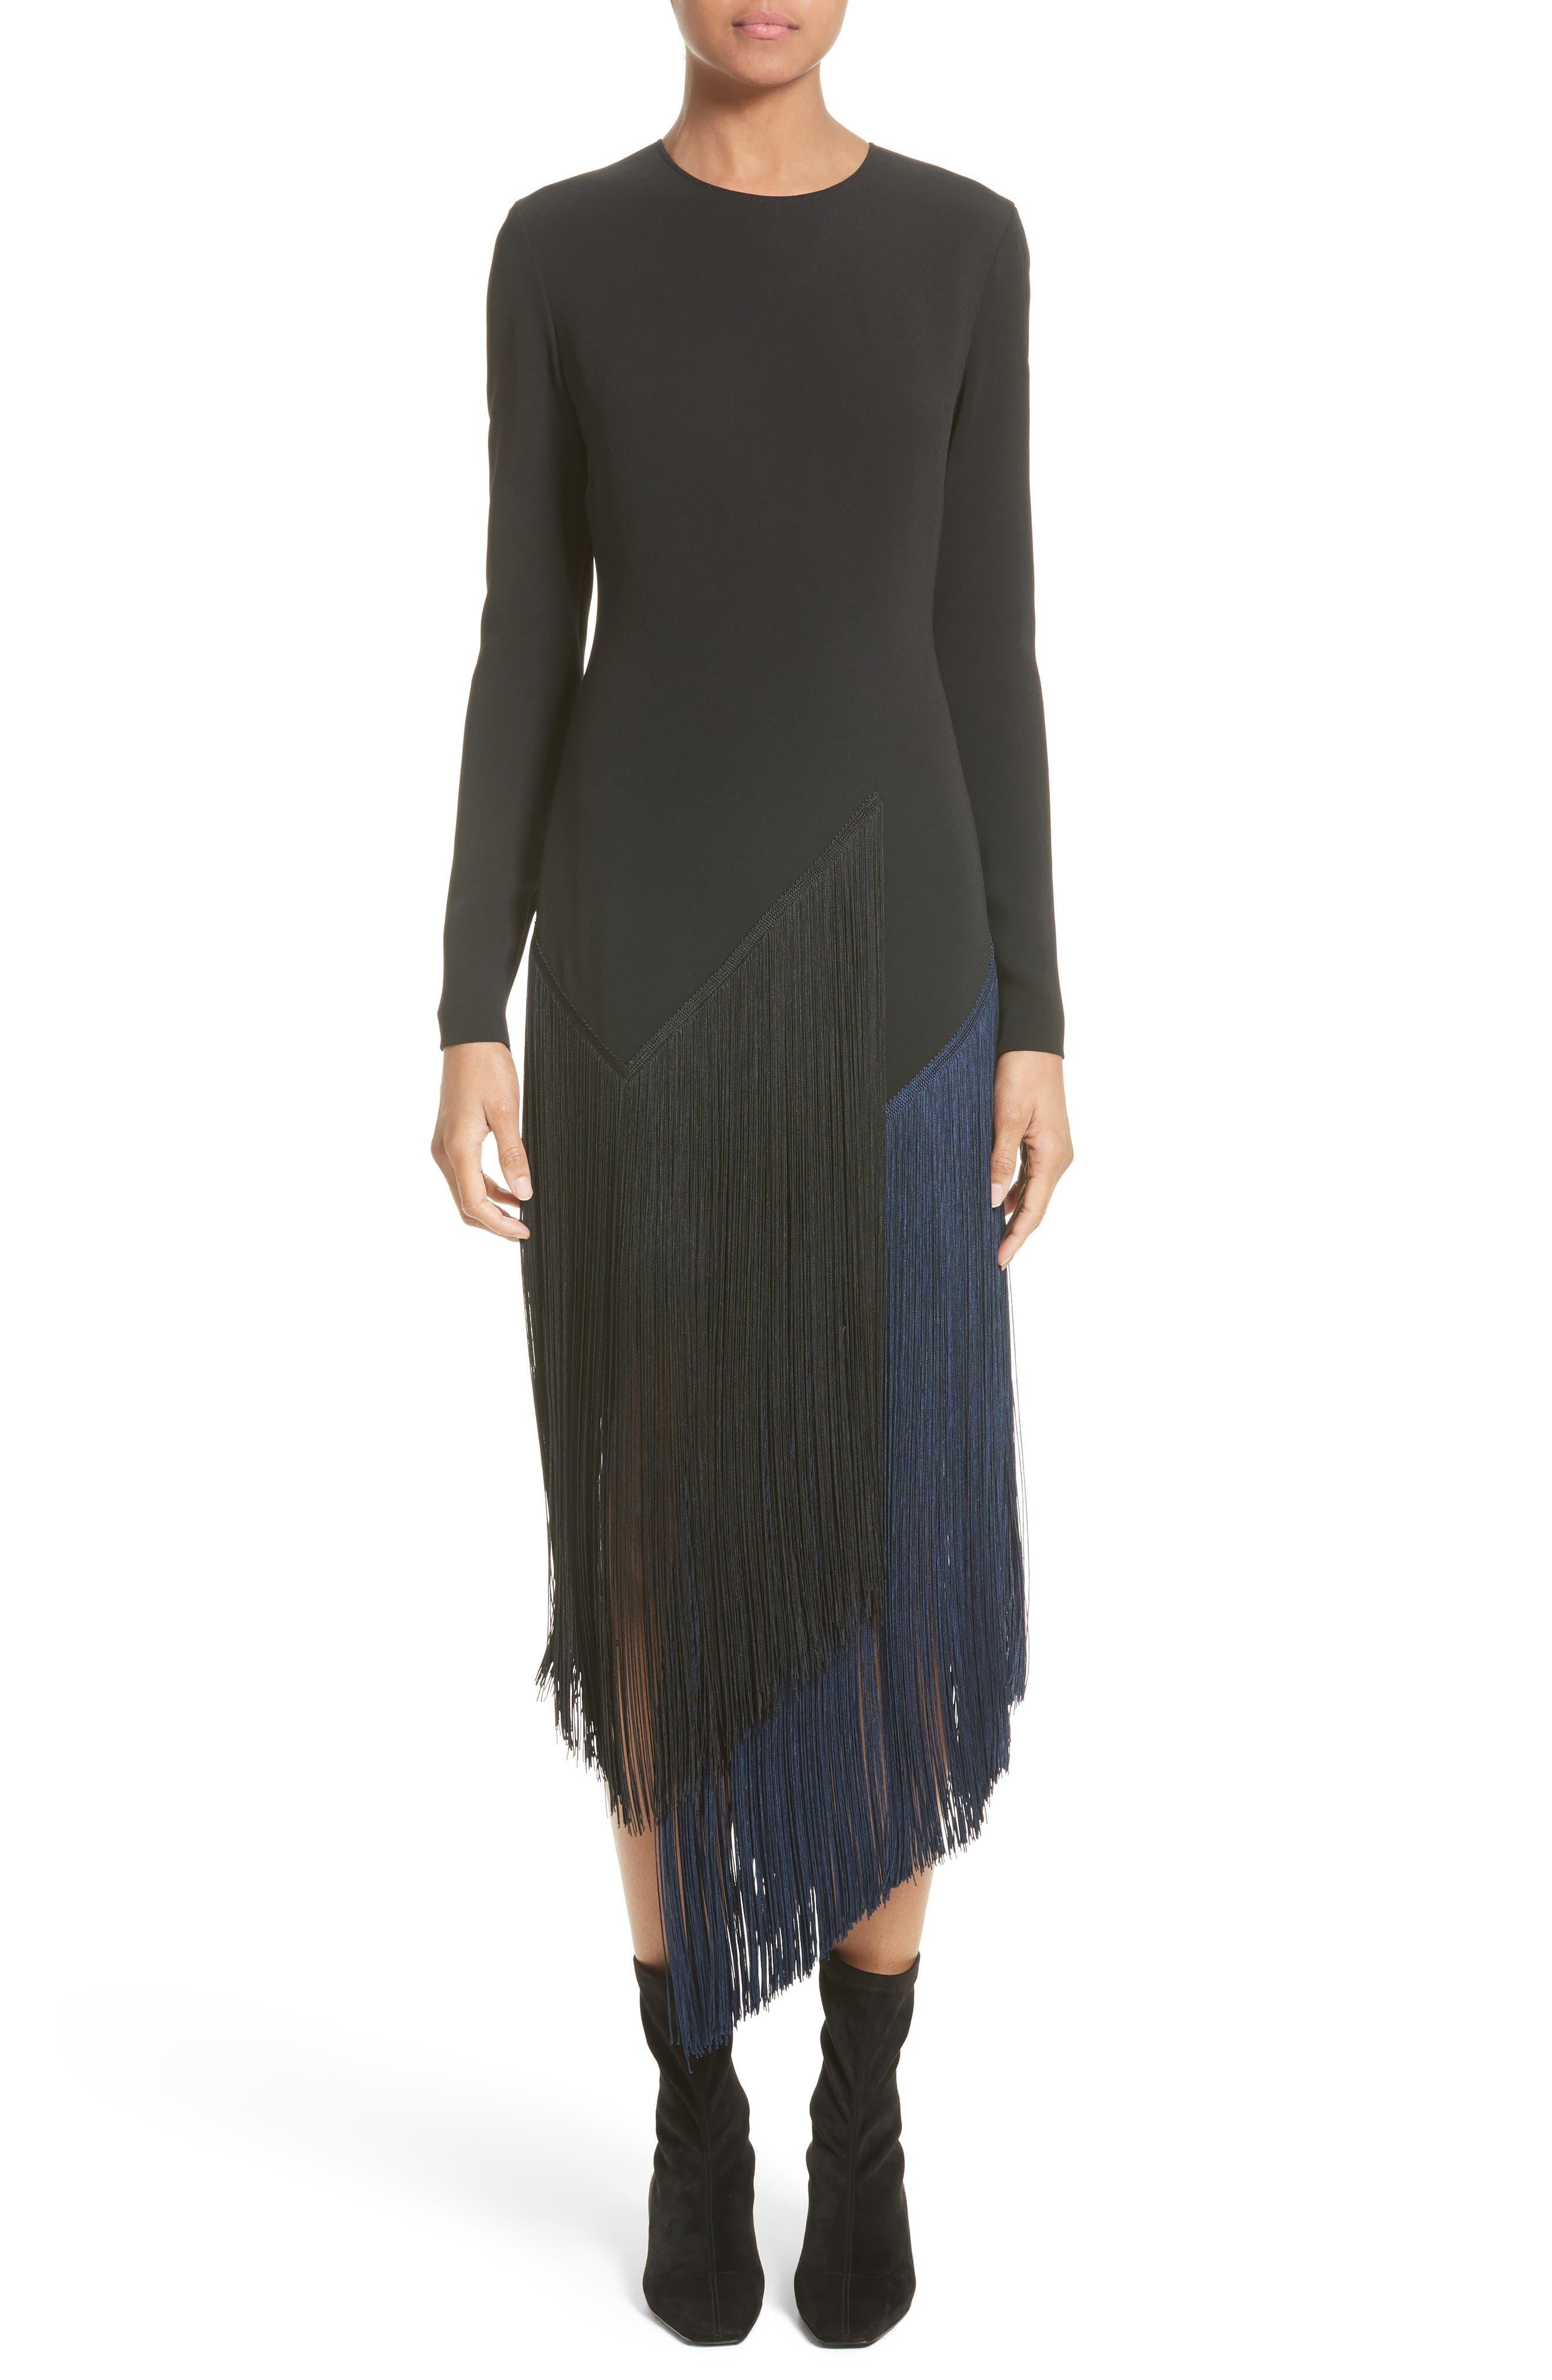 Main Image - Stella McCartney Fringe Skirt Stretch Cady Dress